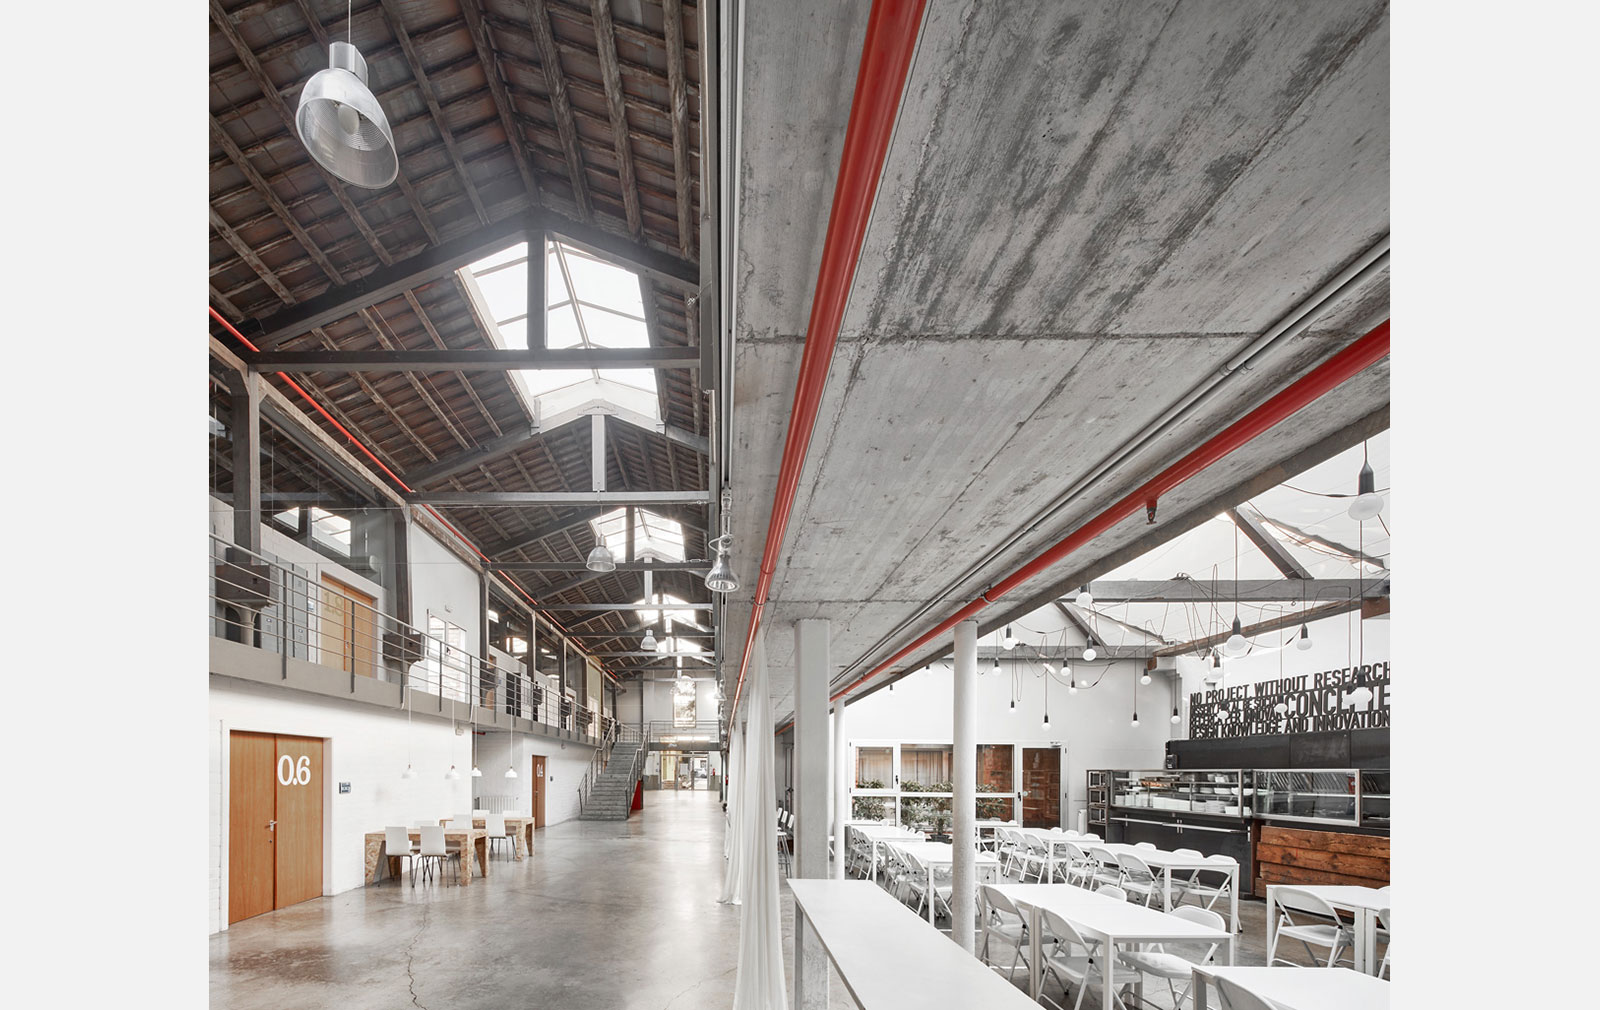 Bau School of Design in Poblenou, Barcelona